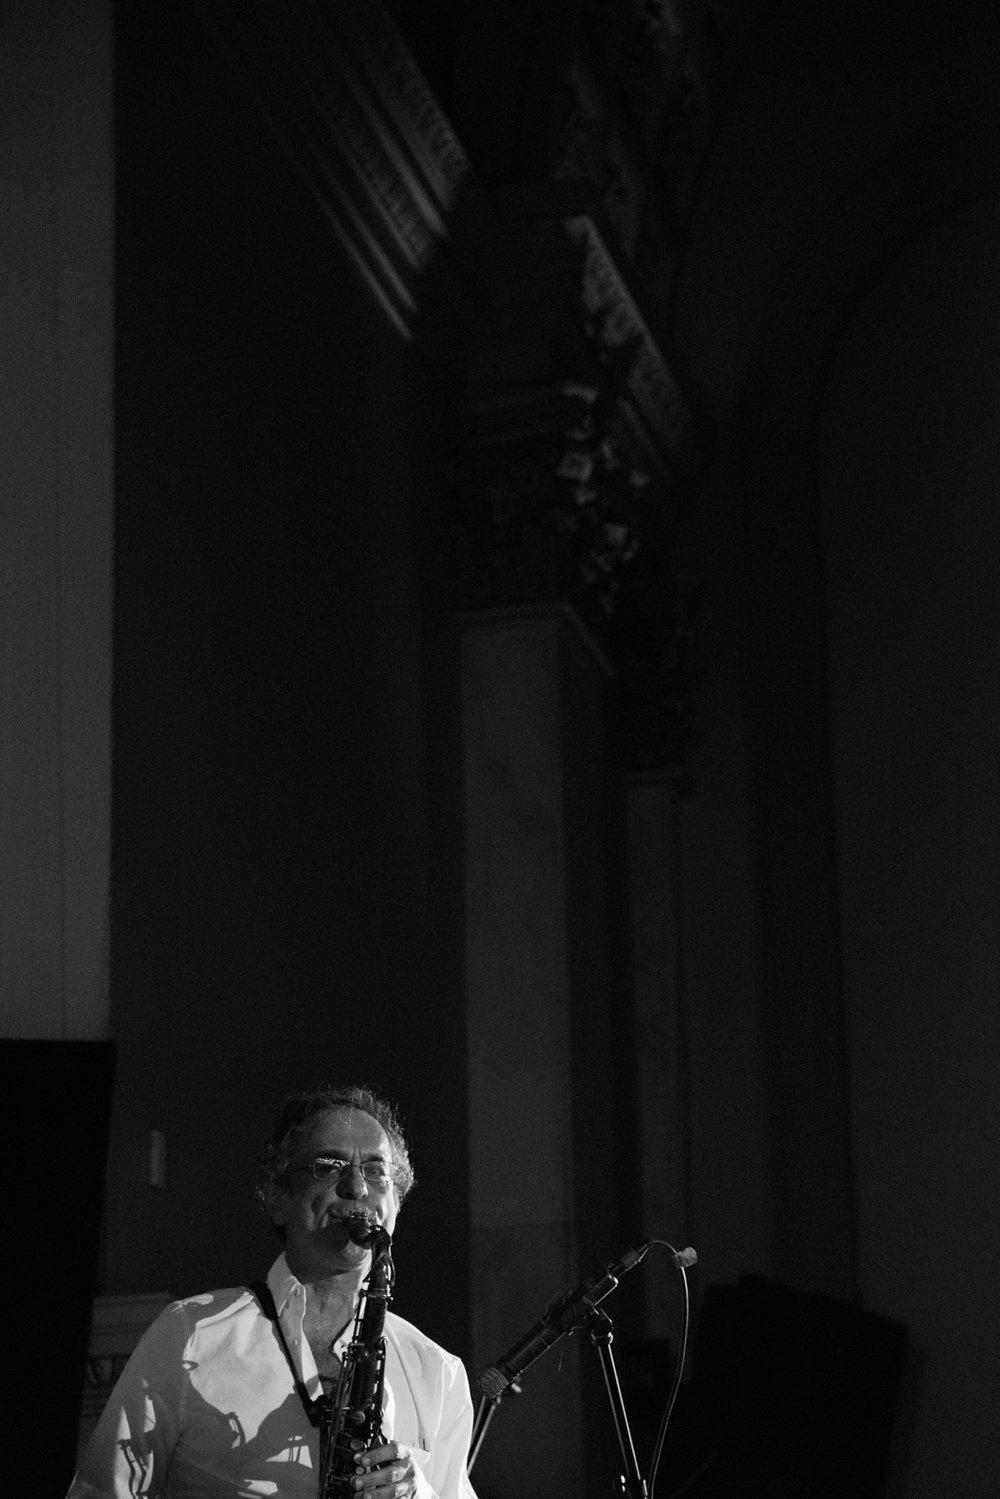 Ivo Perelman, 2017